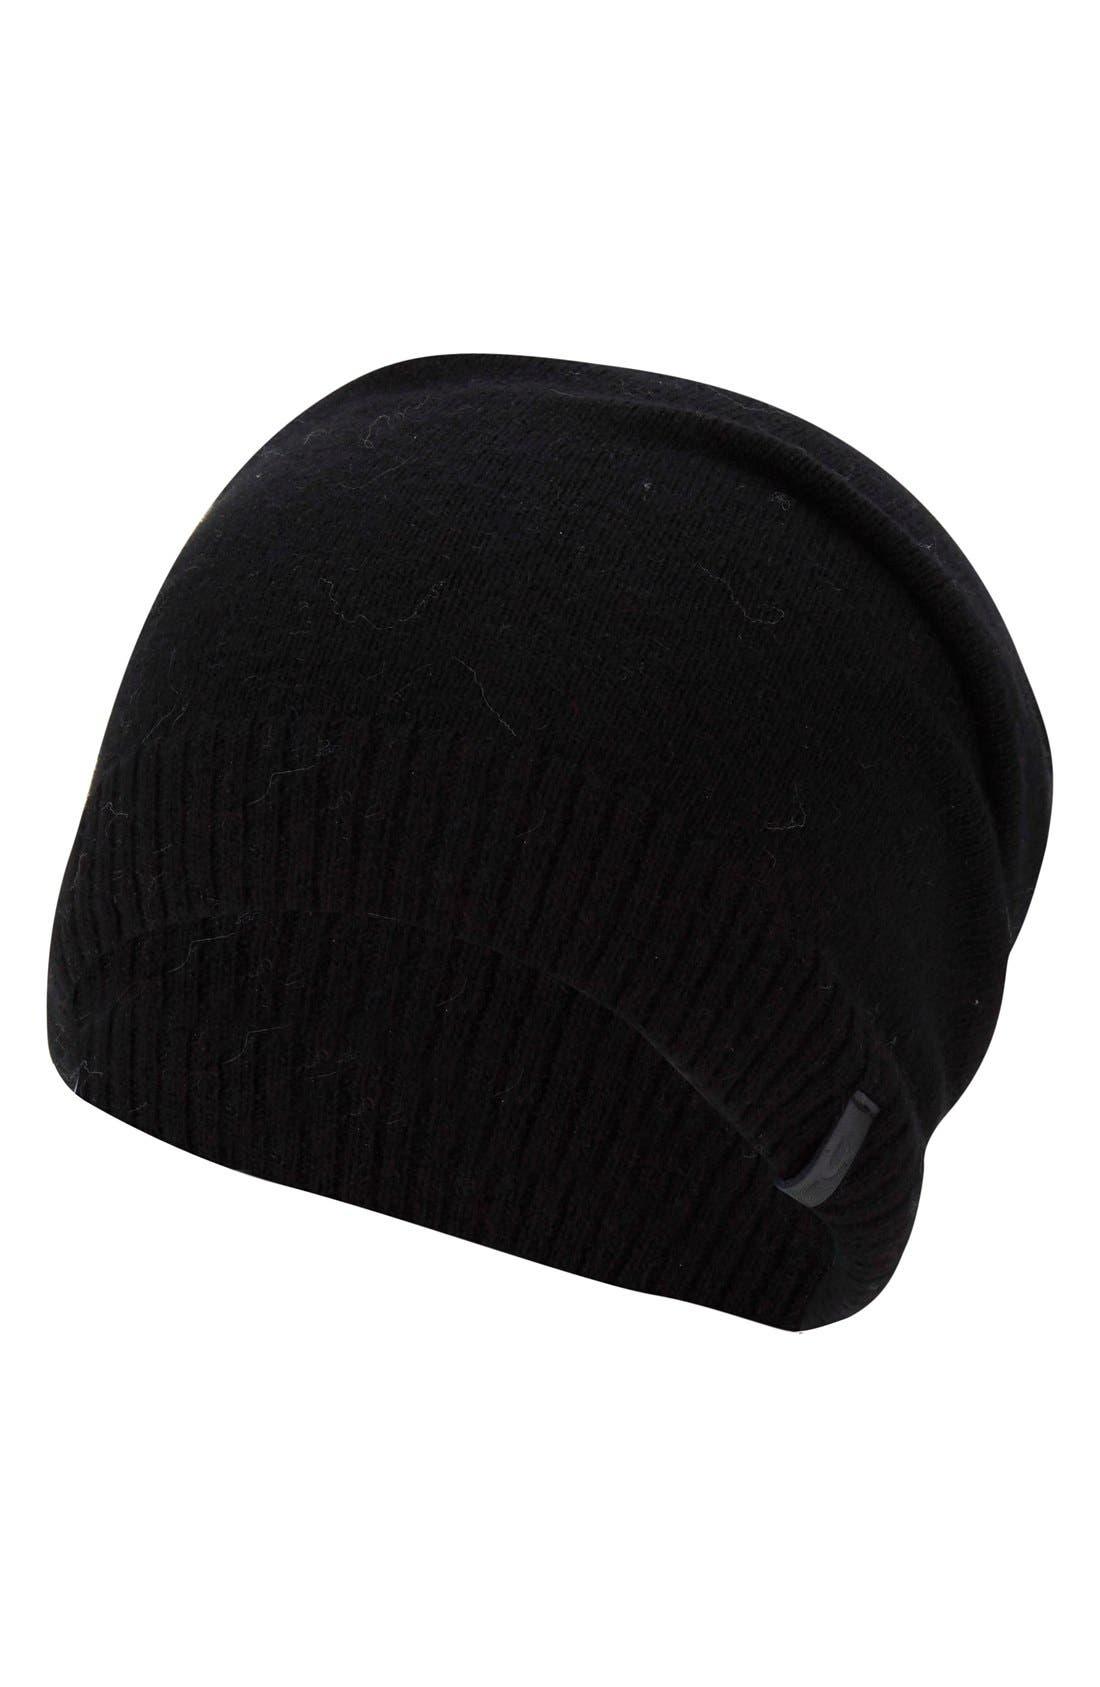 Men's Beanies: Knit Caps & Winter Hats   Nordstrom